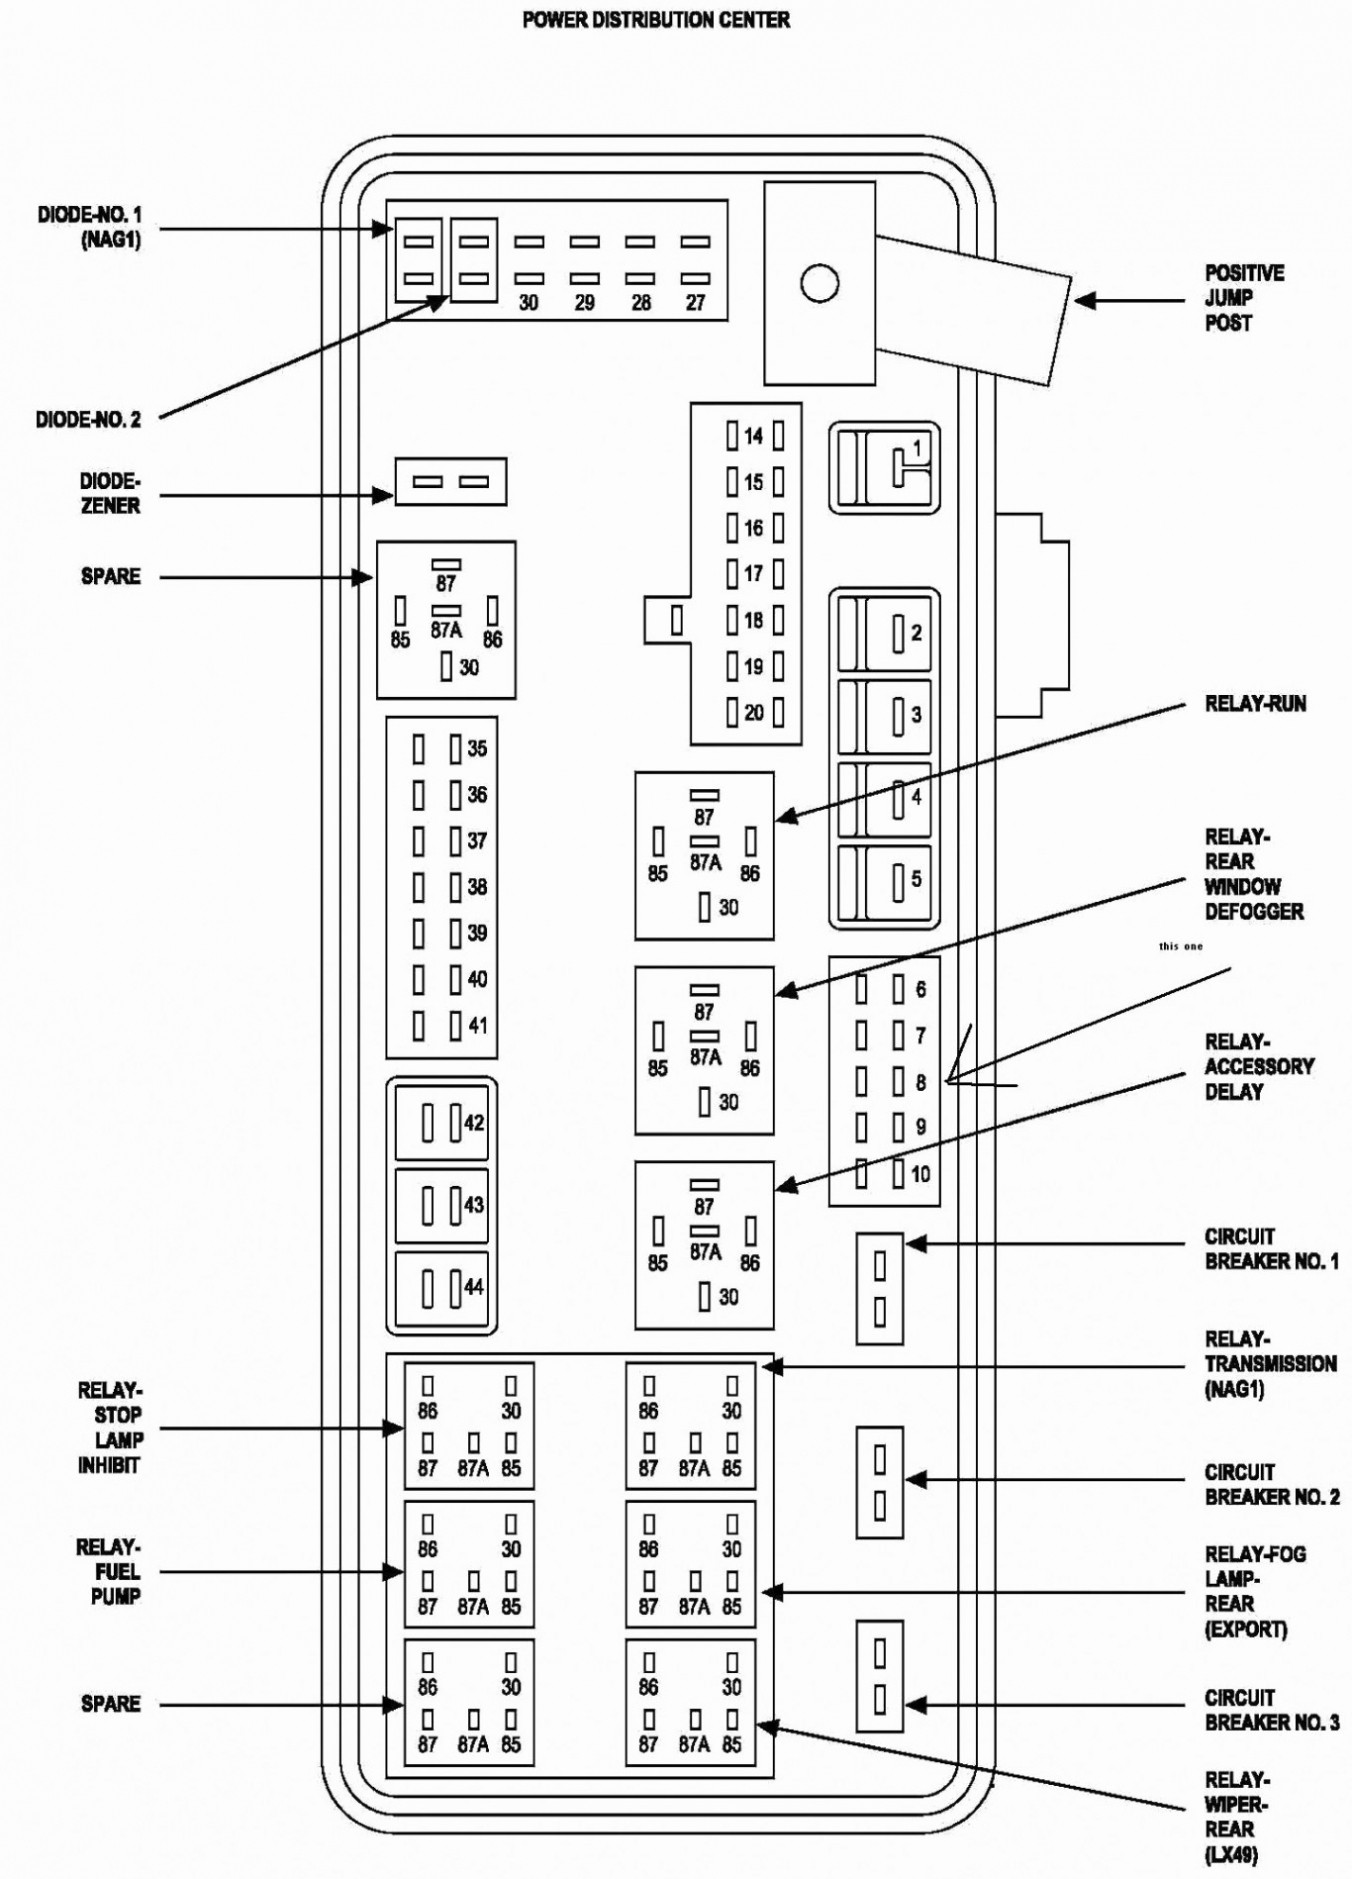 1989 ford f 150 fuse box diagram sv 2064  1989 ford f 250 fuse diagram wiring diagram  1989 ford f 250 fuse diagram wiring diagram